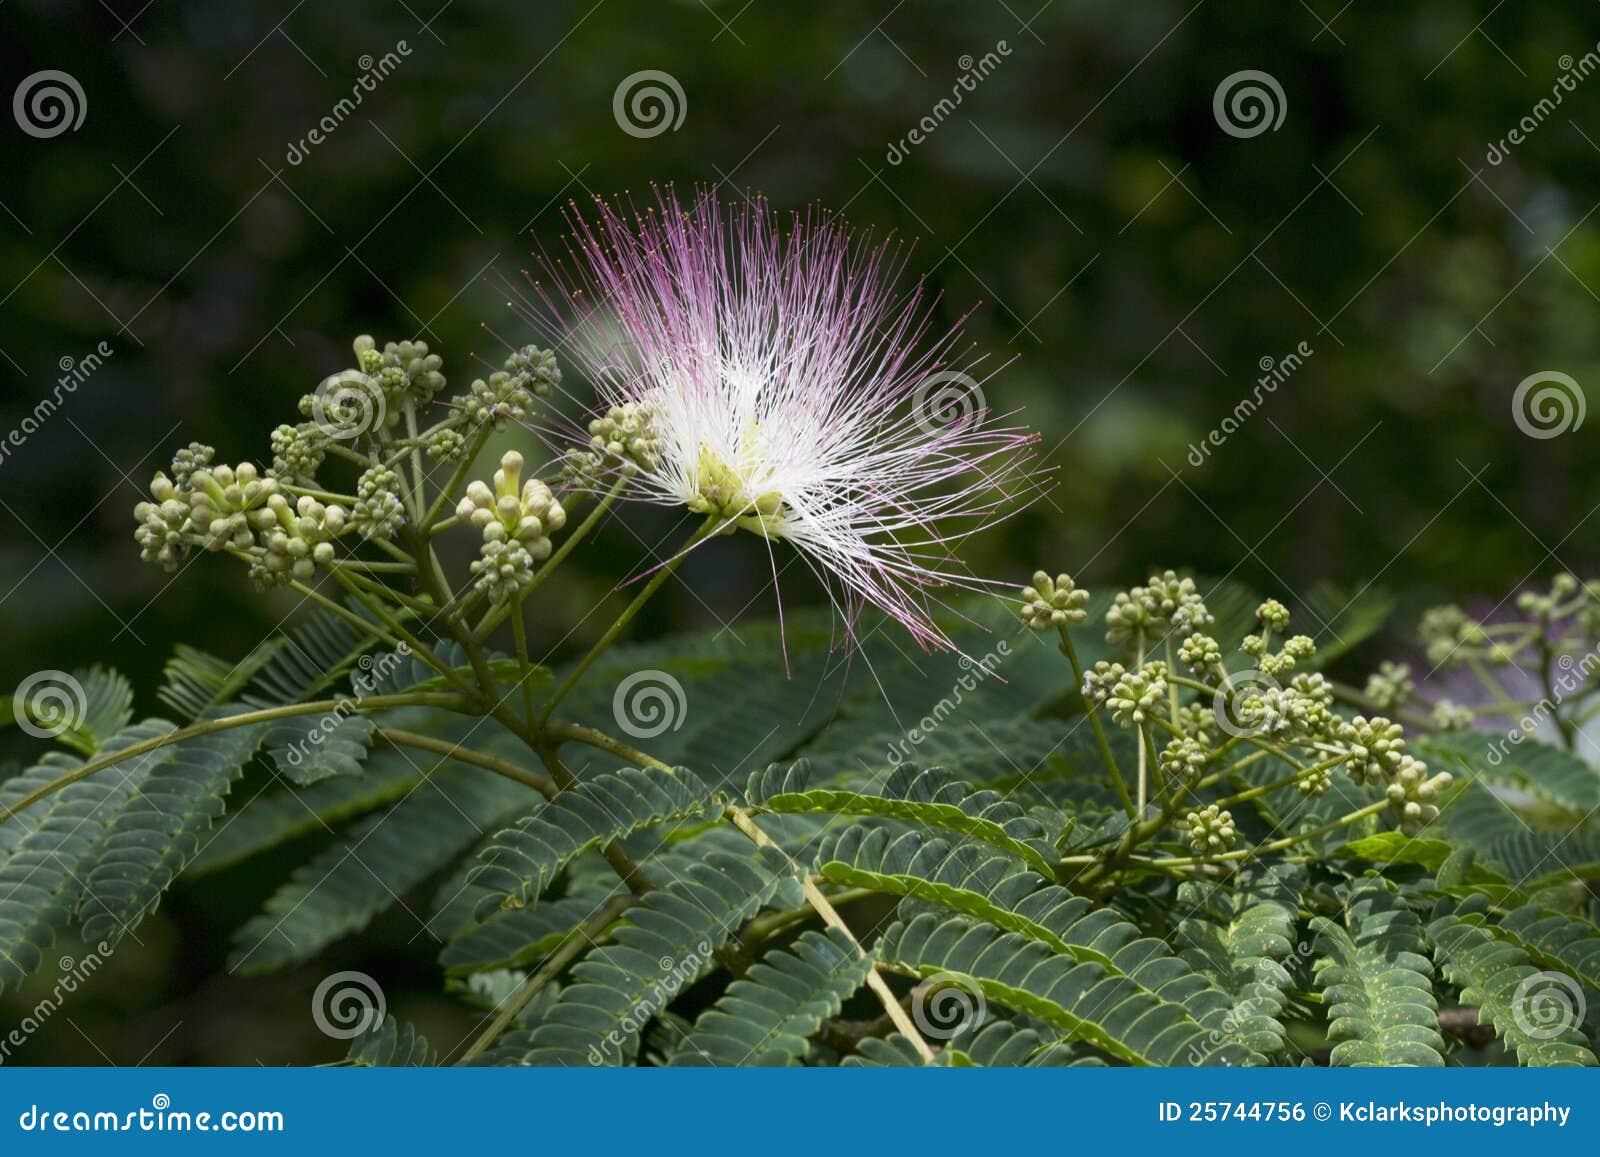 Alabama Silk Mimosa Tree Flowering Stages